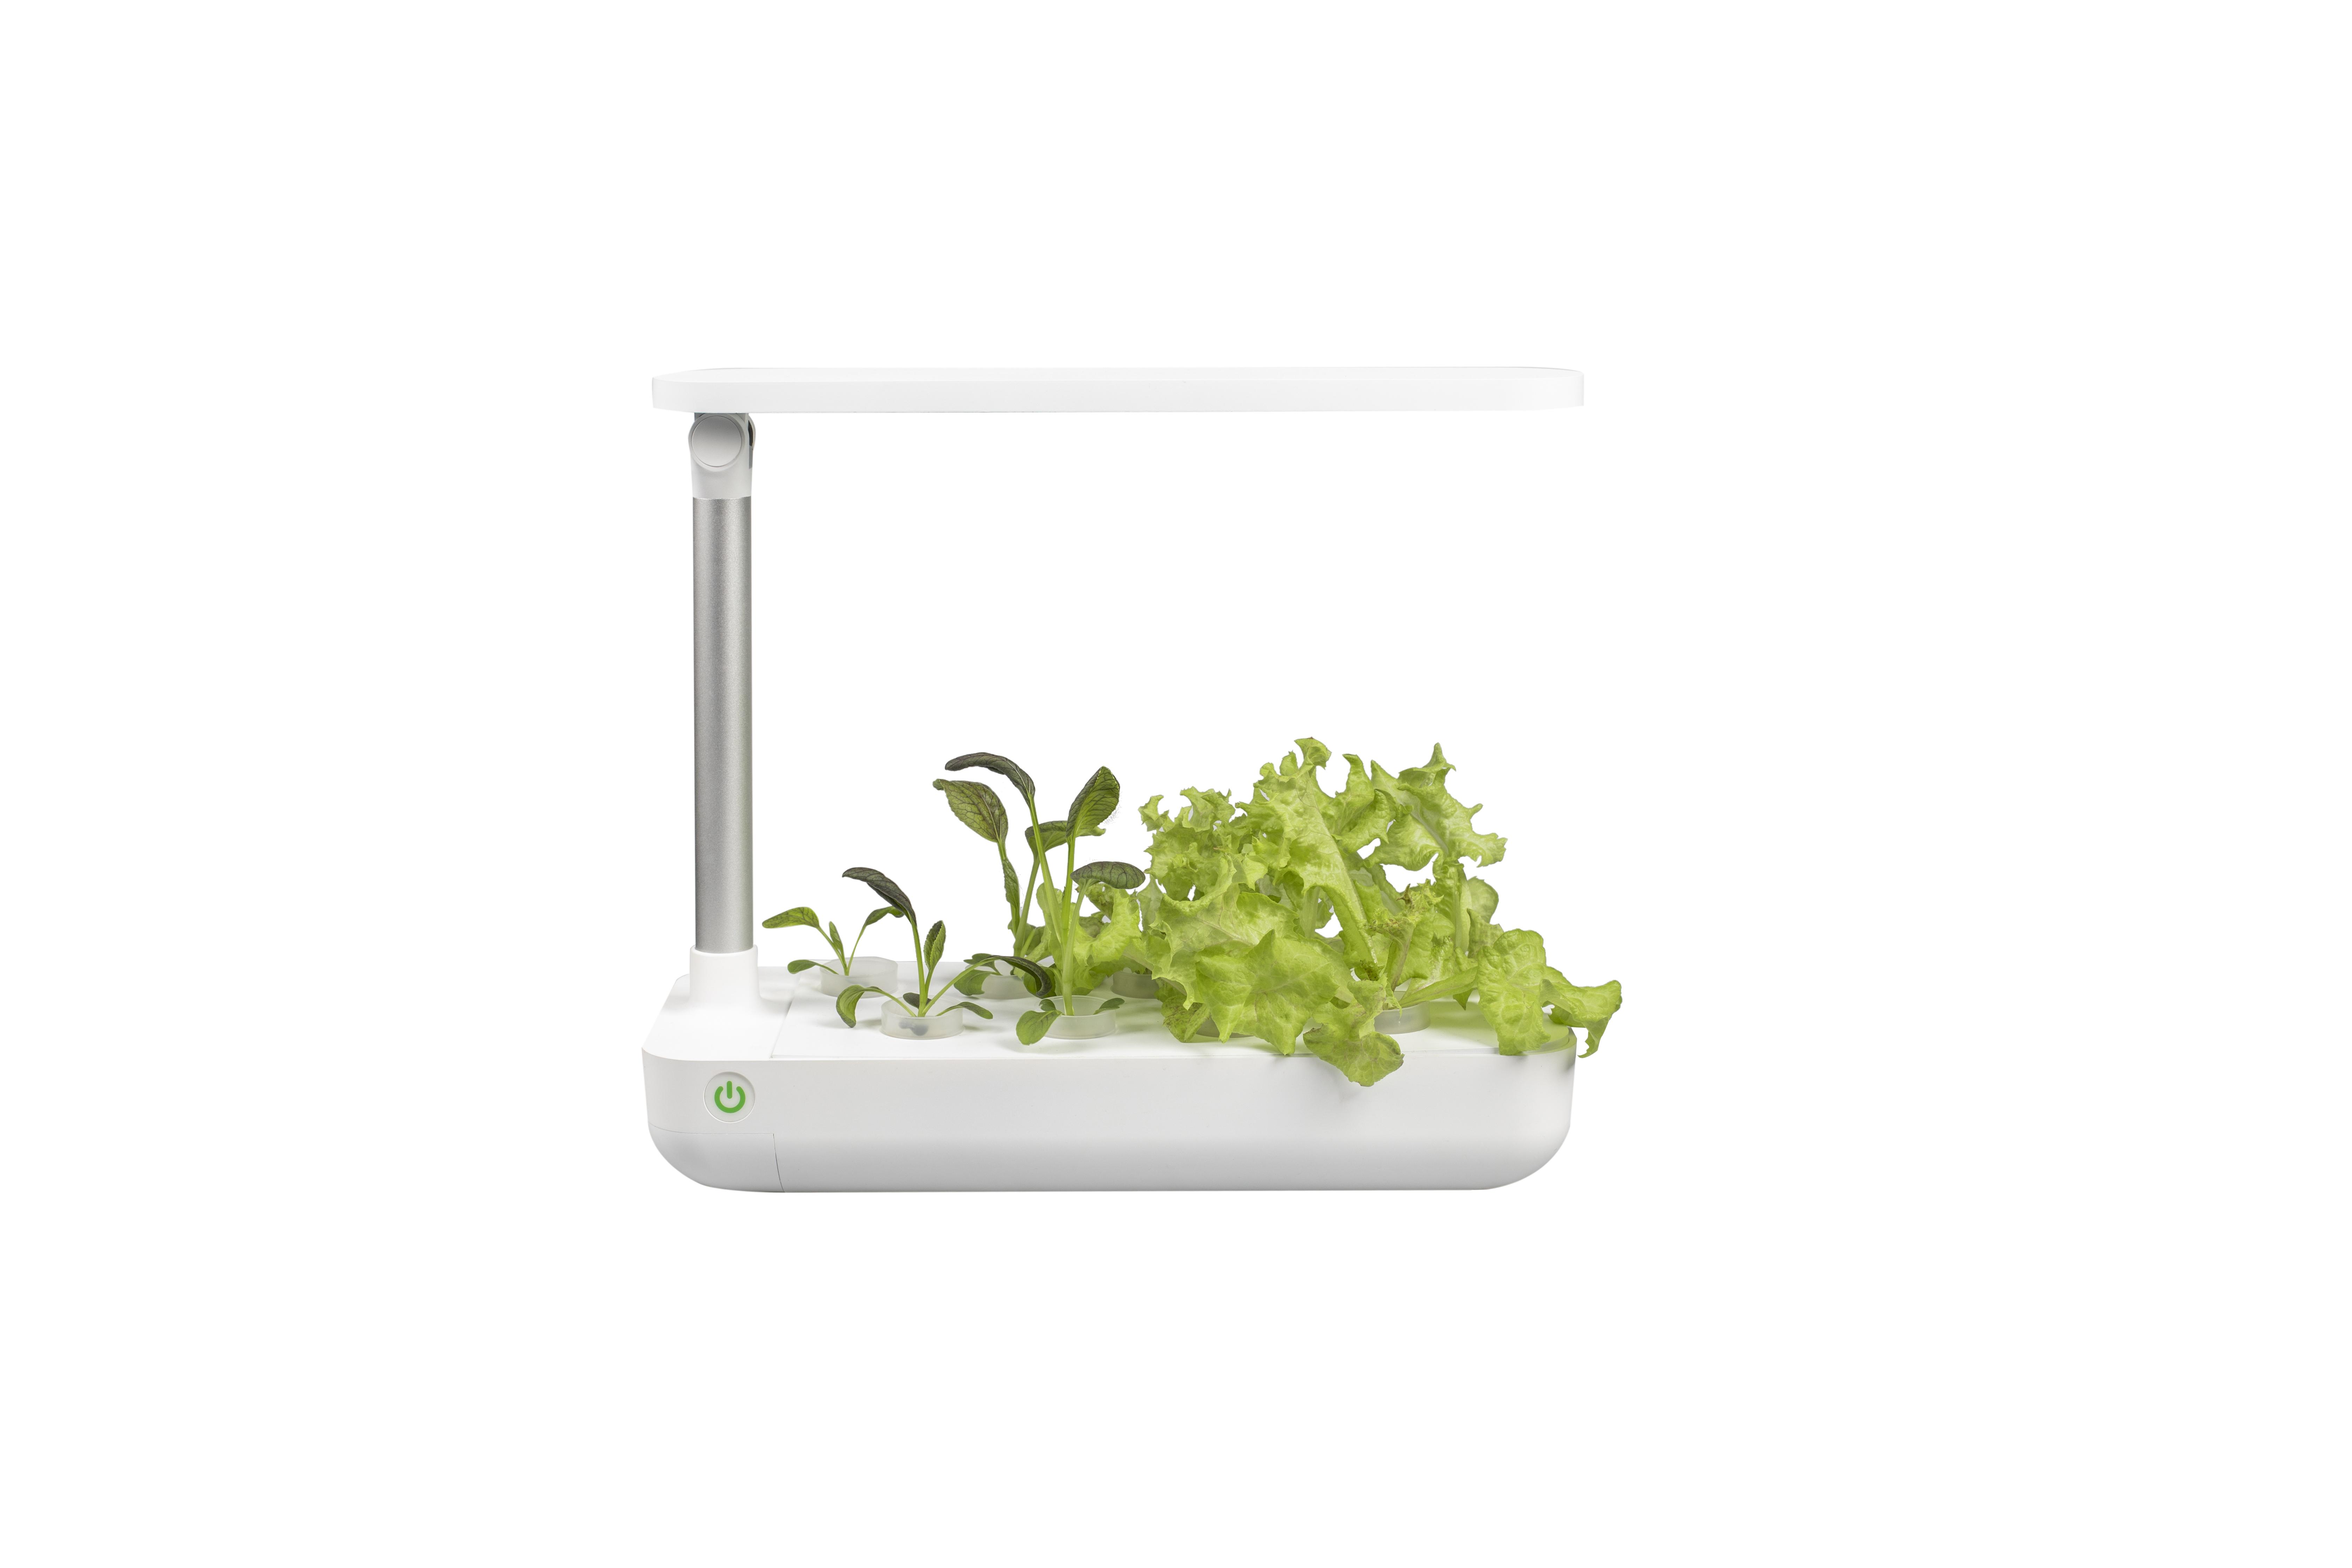 VegeBOX Table Vegebox planting machine with EU plug, white